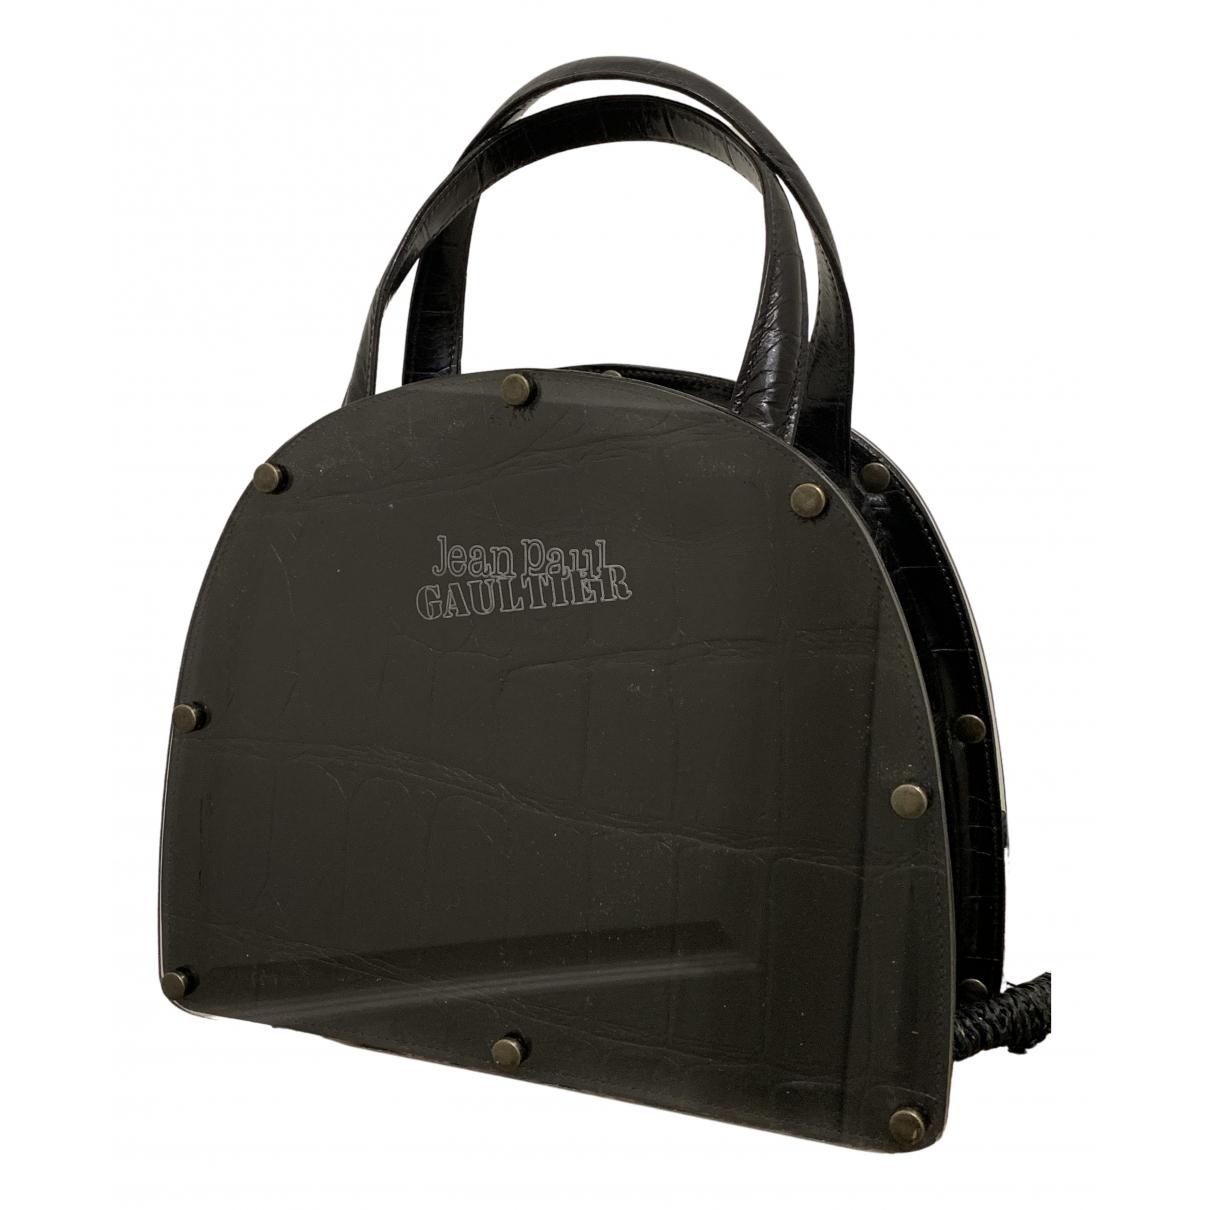 Jean Paul Gaultier \N Black Leather handbag for Women \N